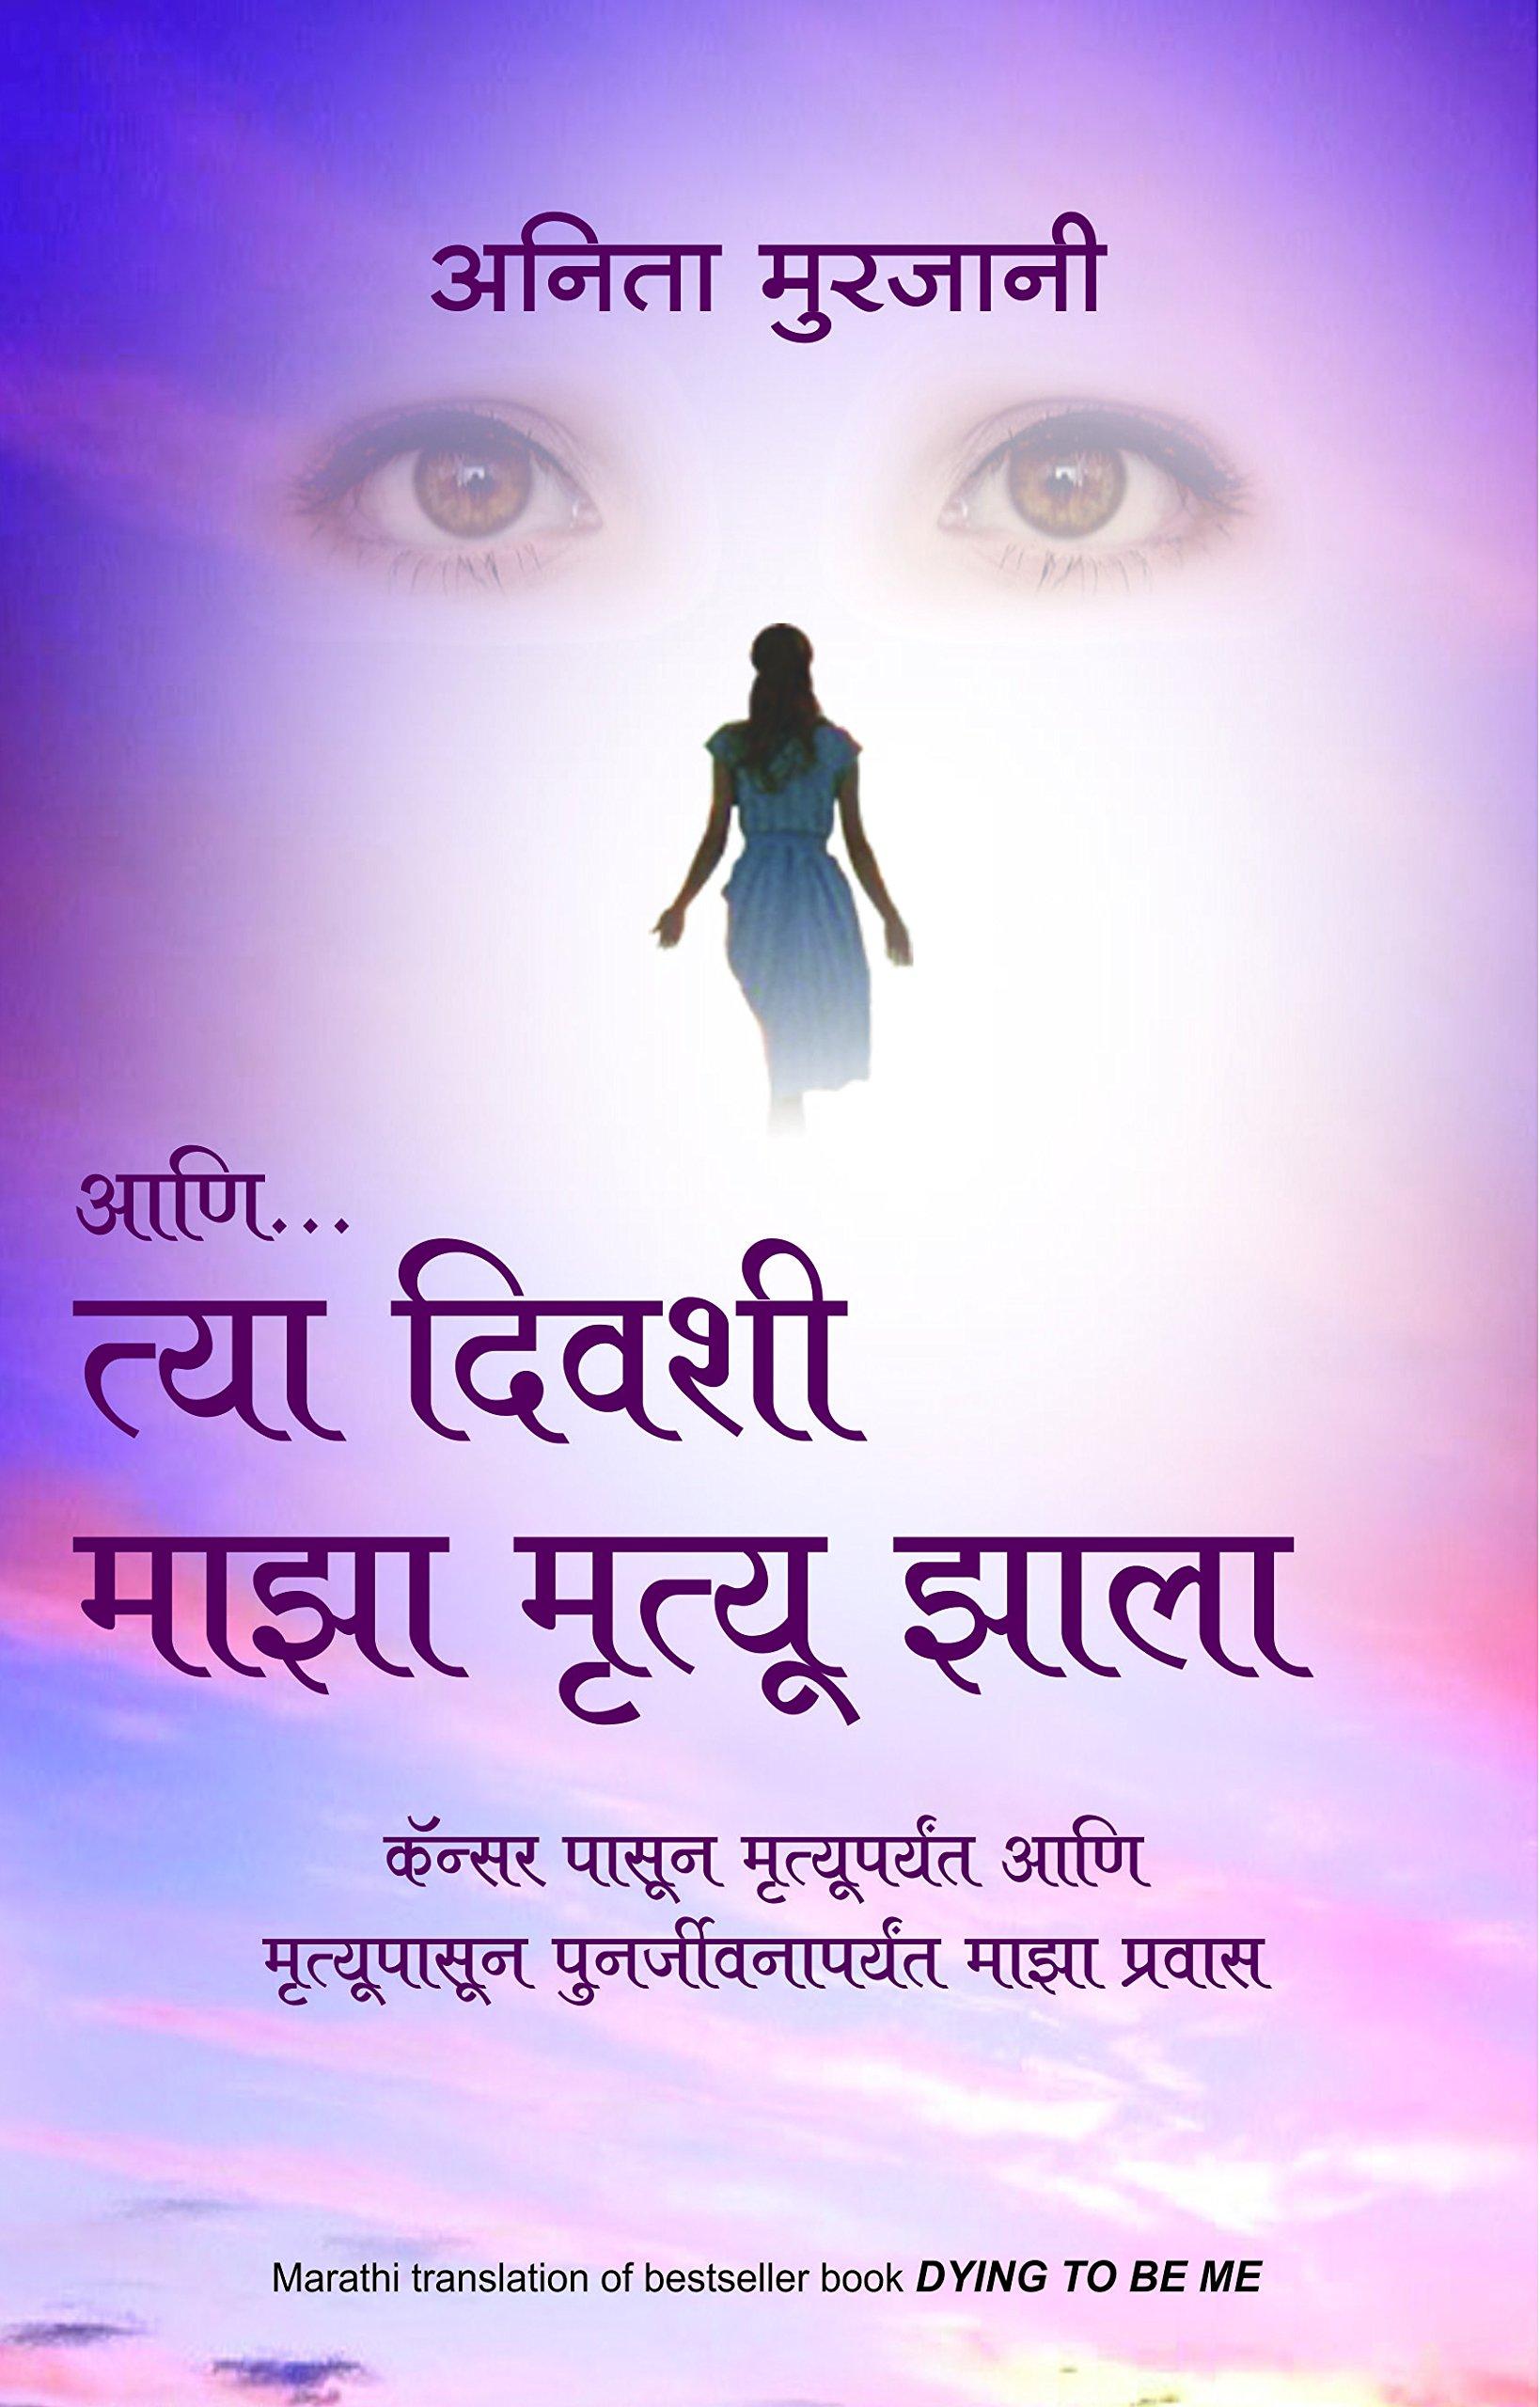 ... Tya Divashi Maza Mrutyu Zala (Marathi Translation - 1638x2560 - jpeg